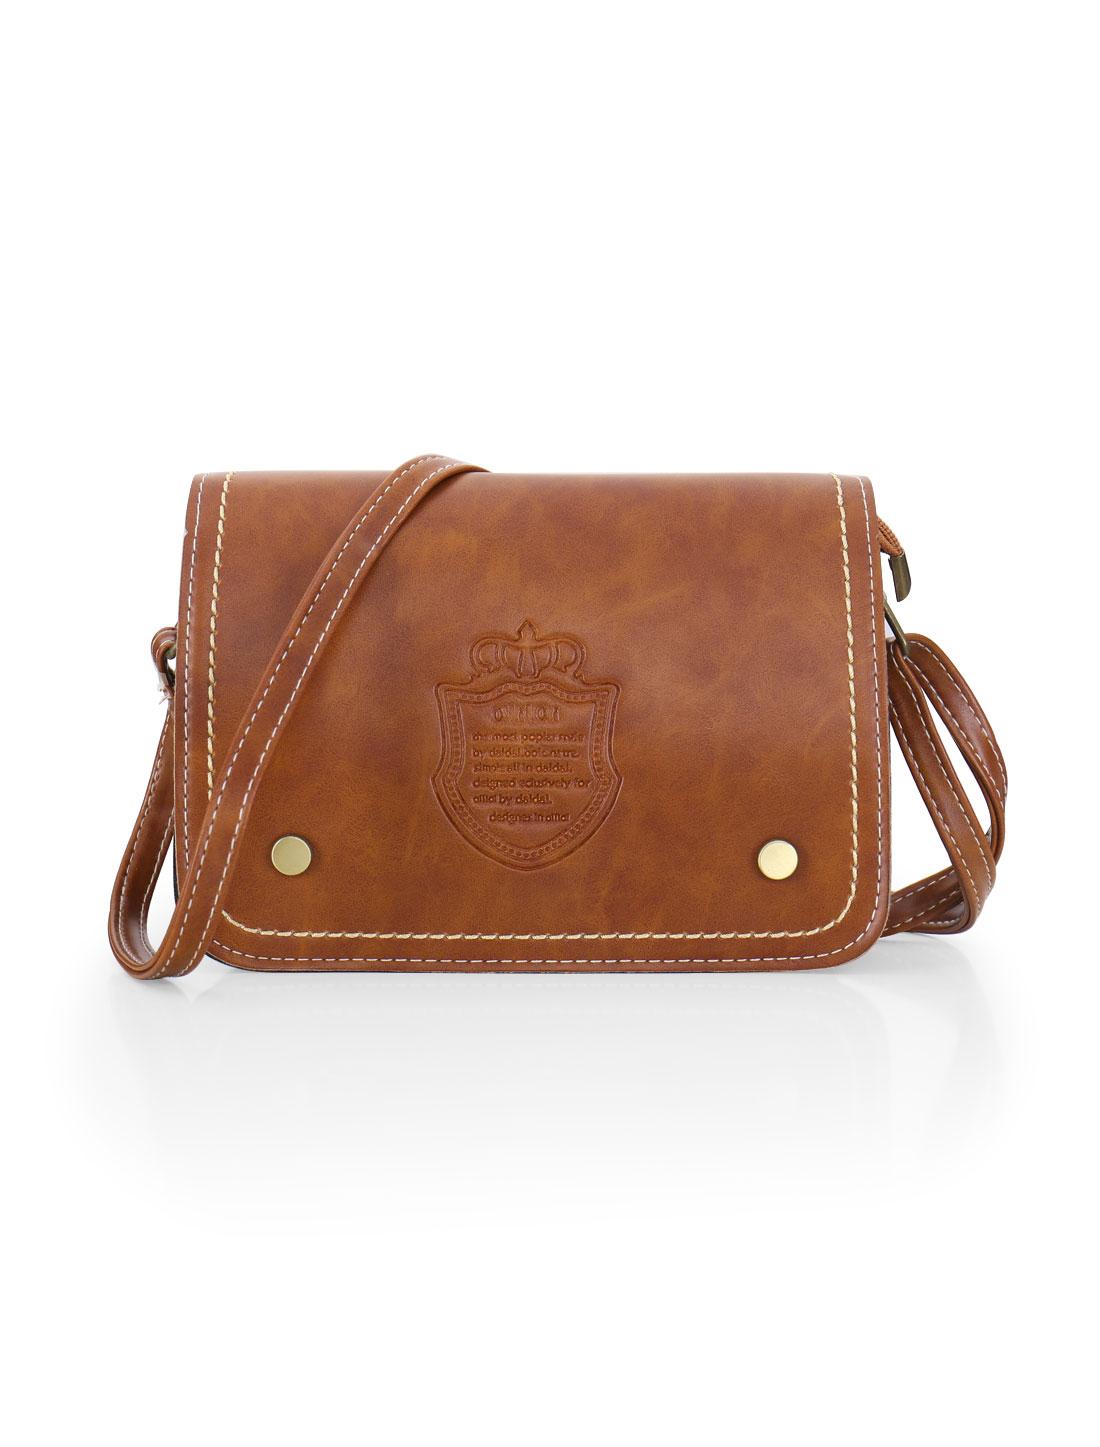 Women Letters Crown Embossed Magnetic Flap Closure Crossbody Bag Light Brown